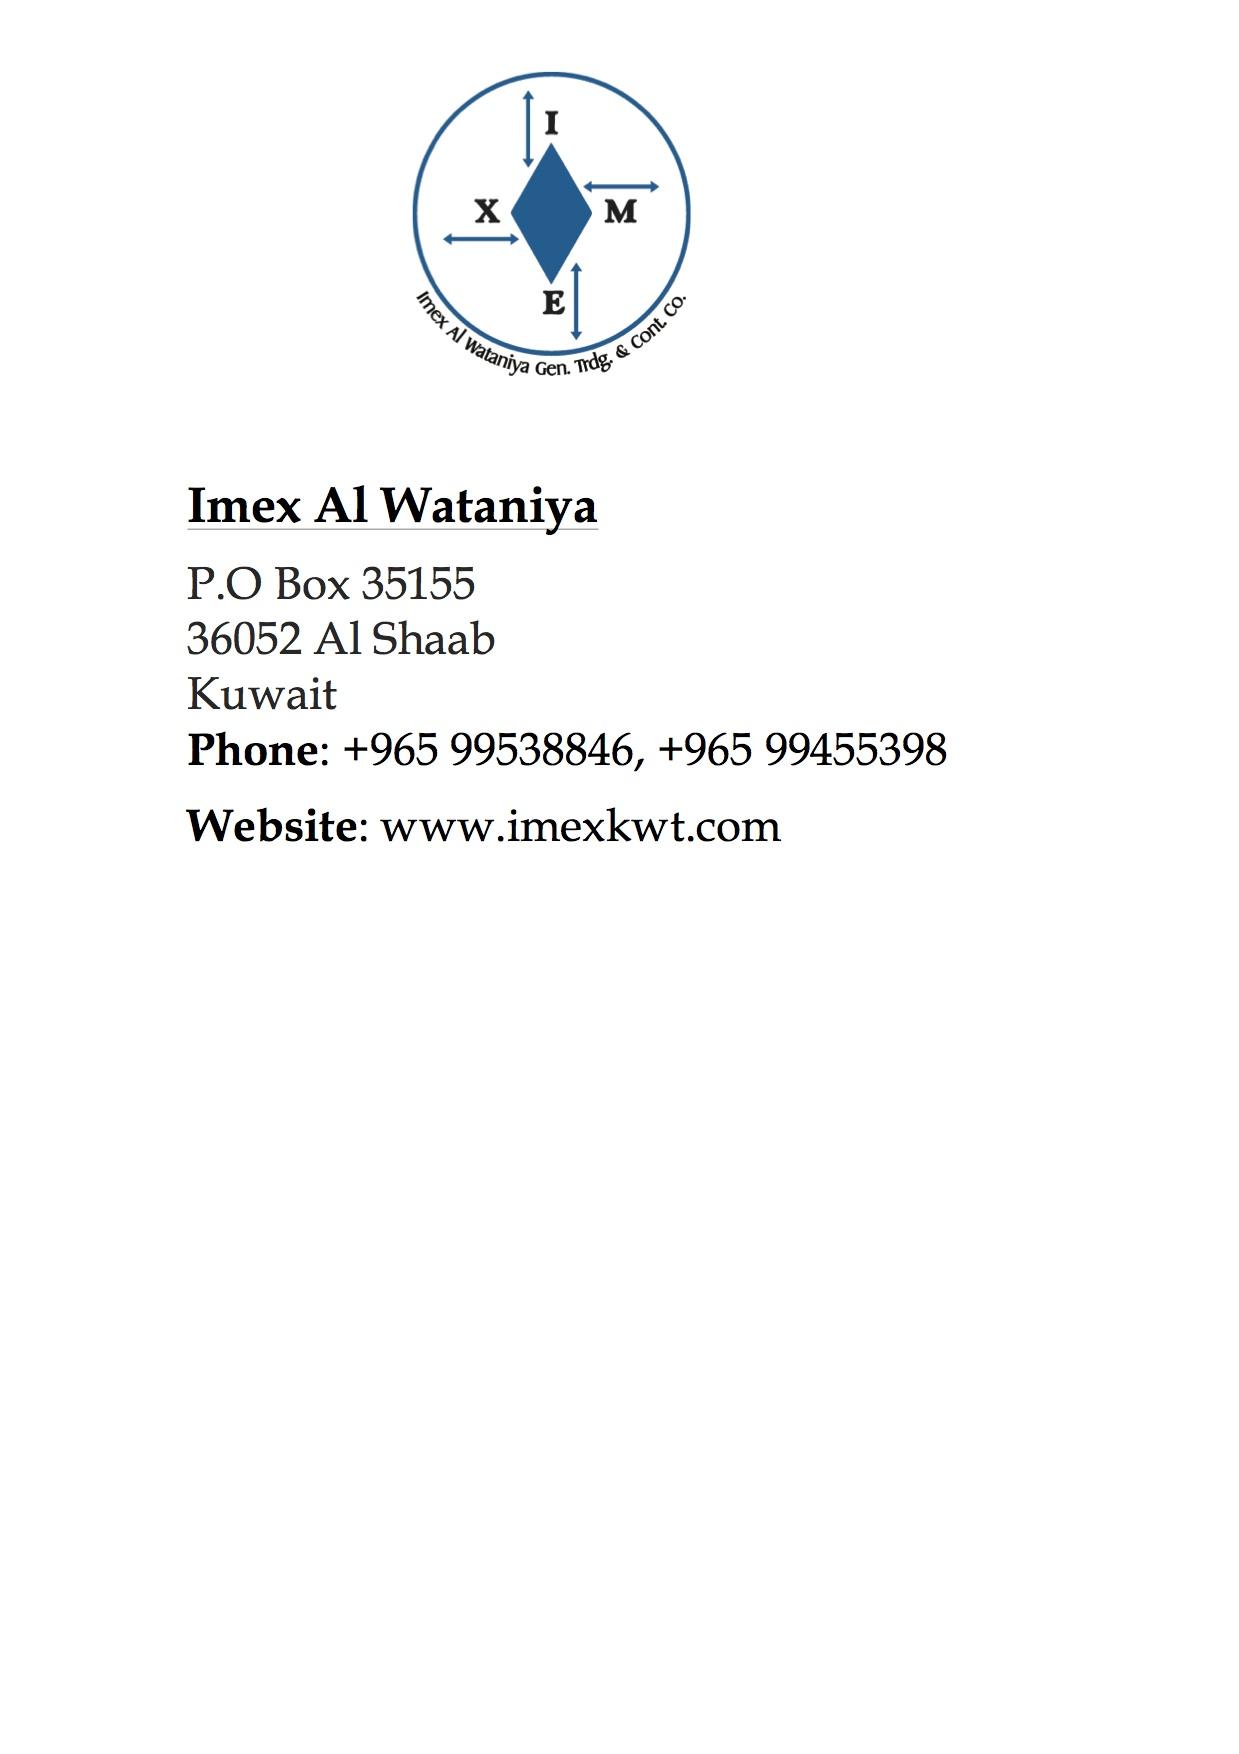 Imex Al Wataniya.jpg